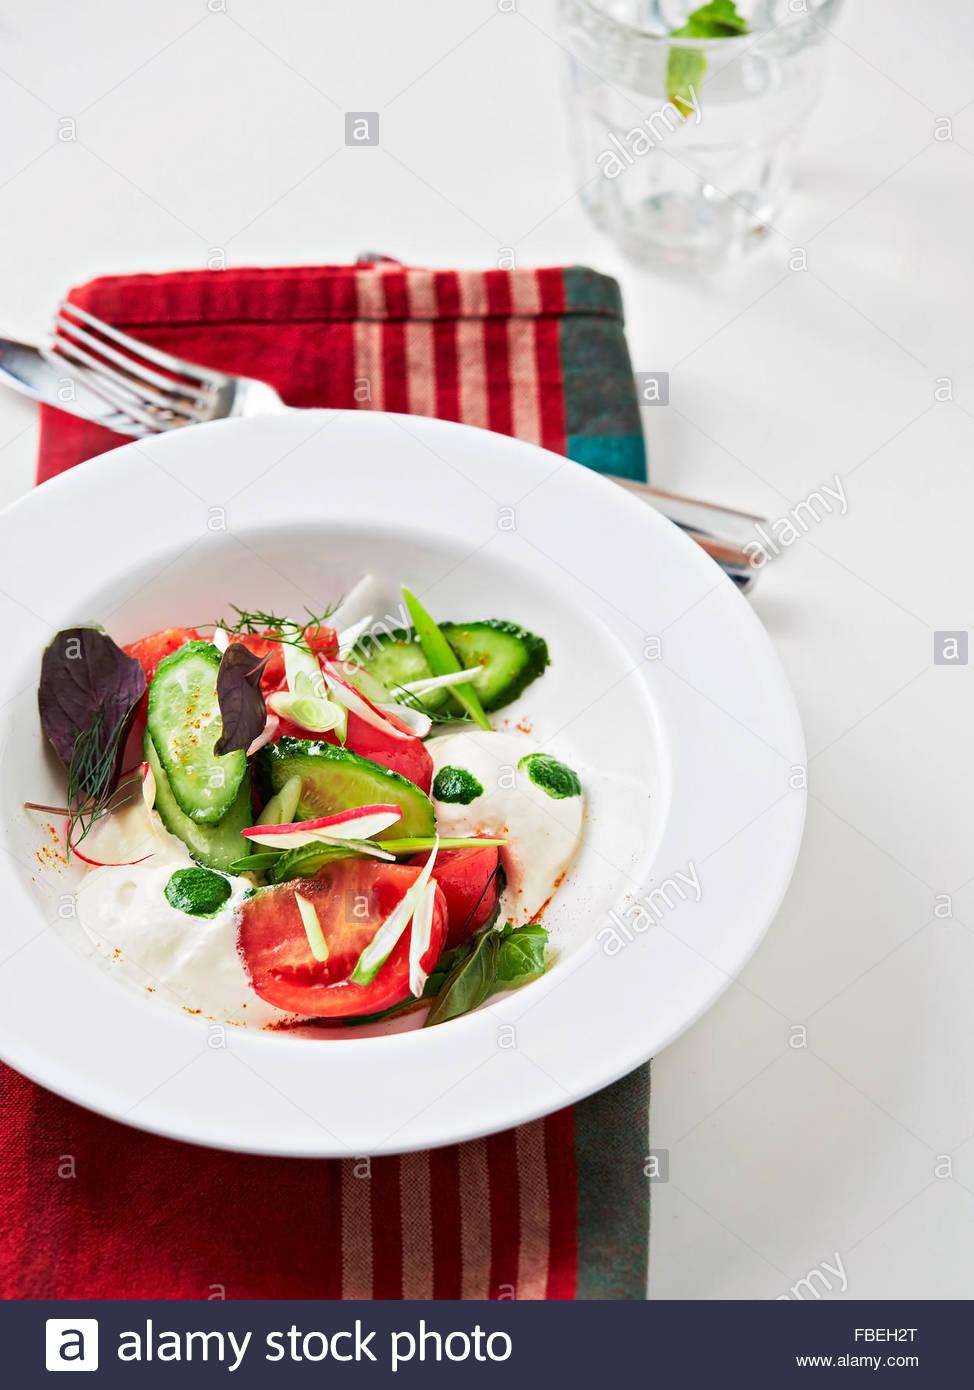 Fresh salad with cucumber, basil, tomatoes - Stock Image